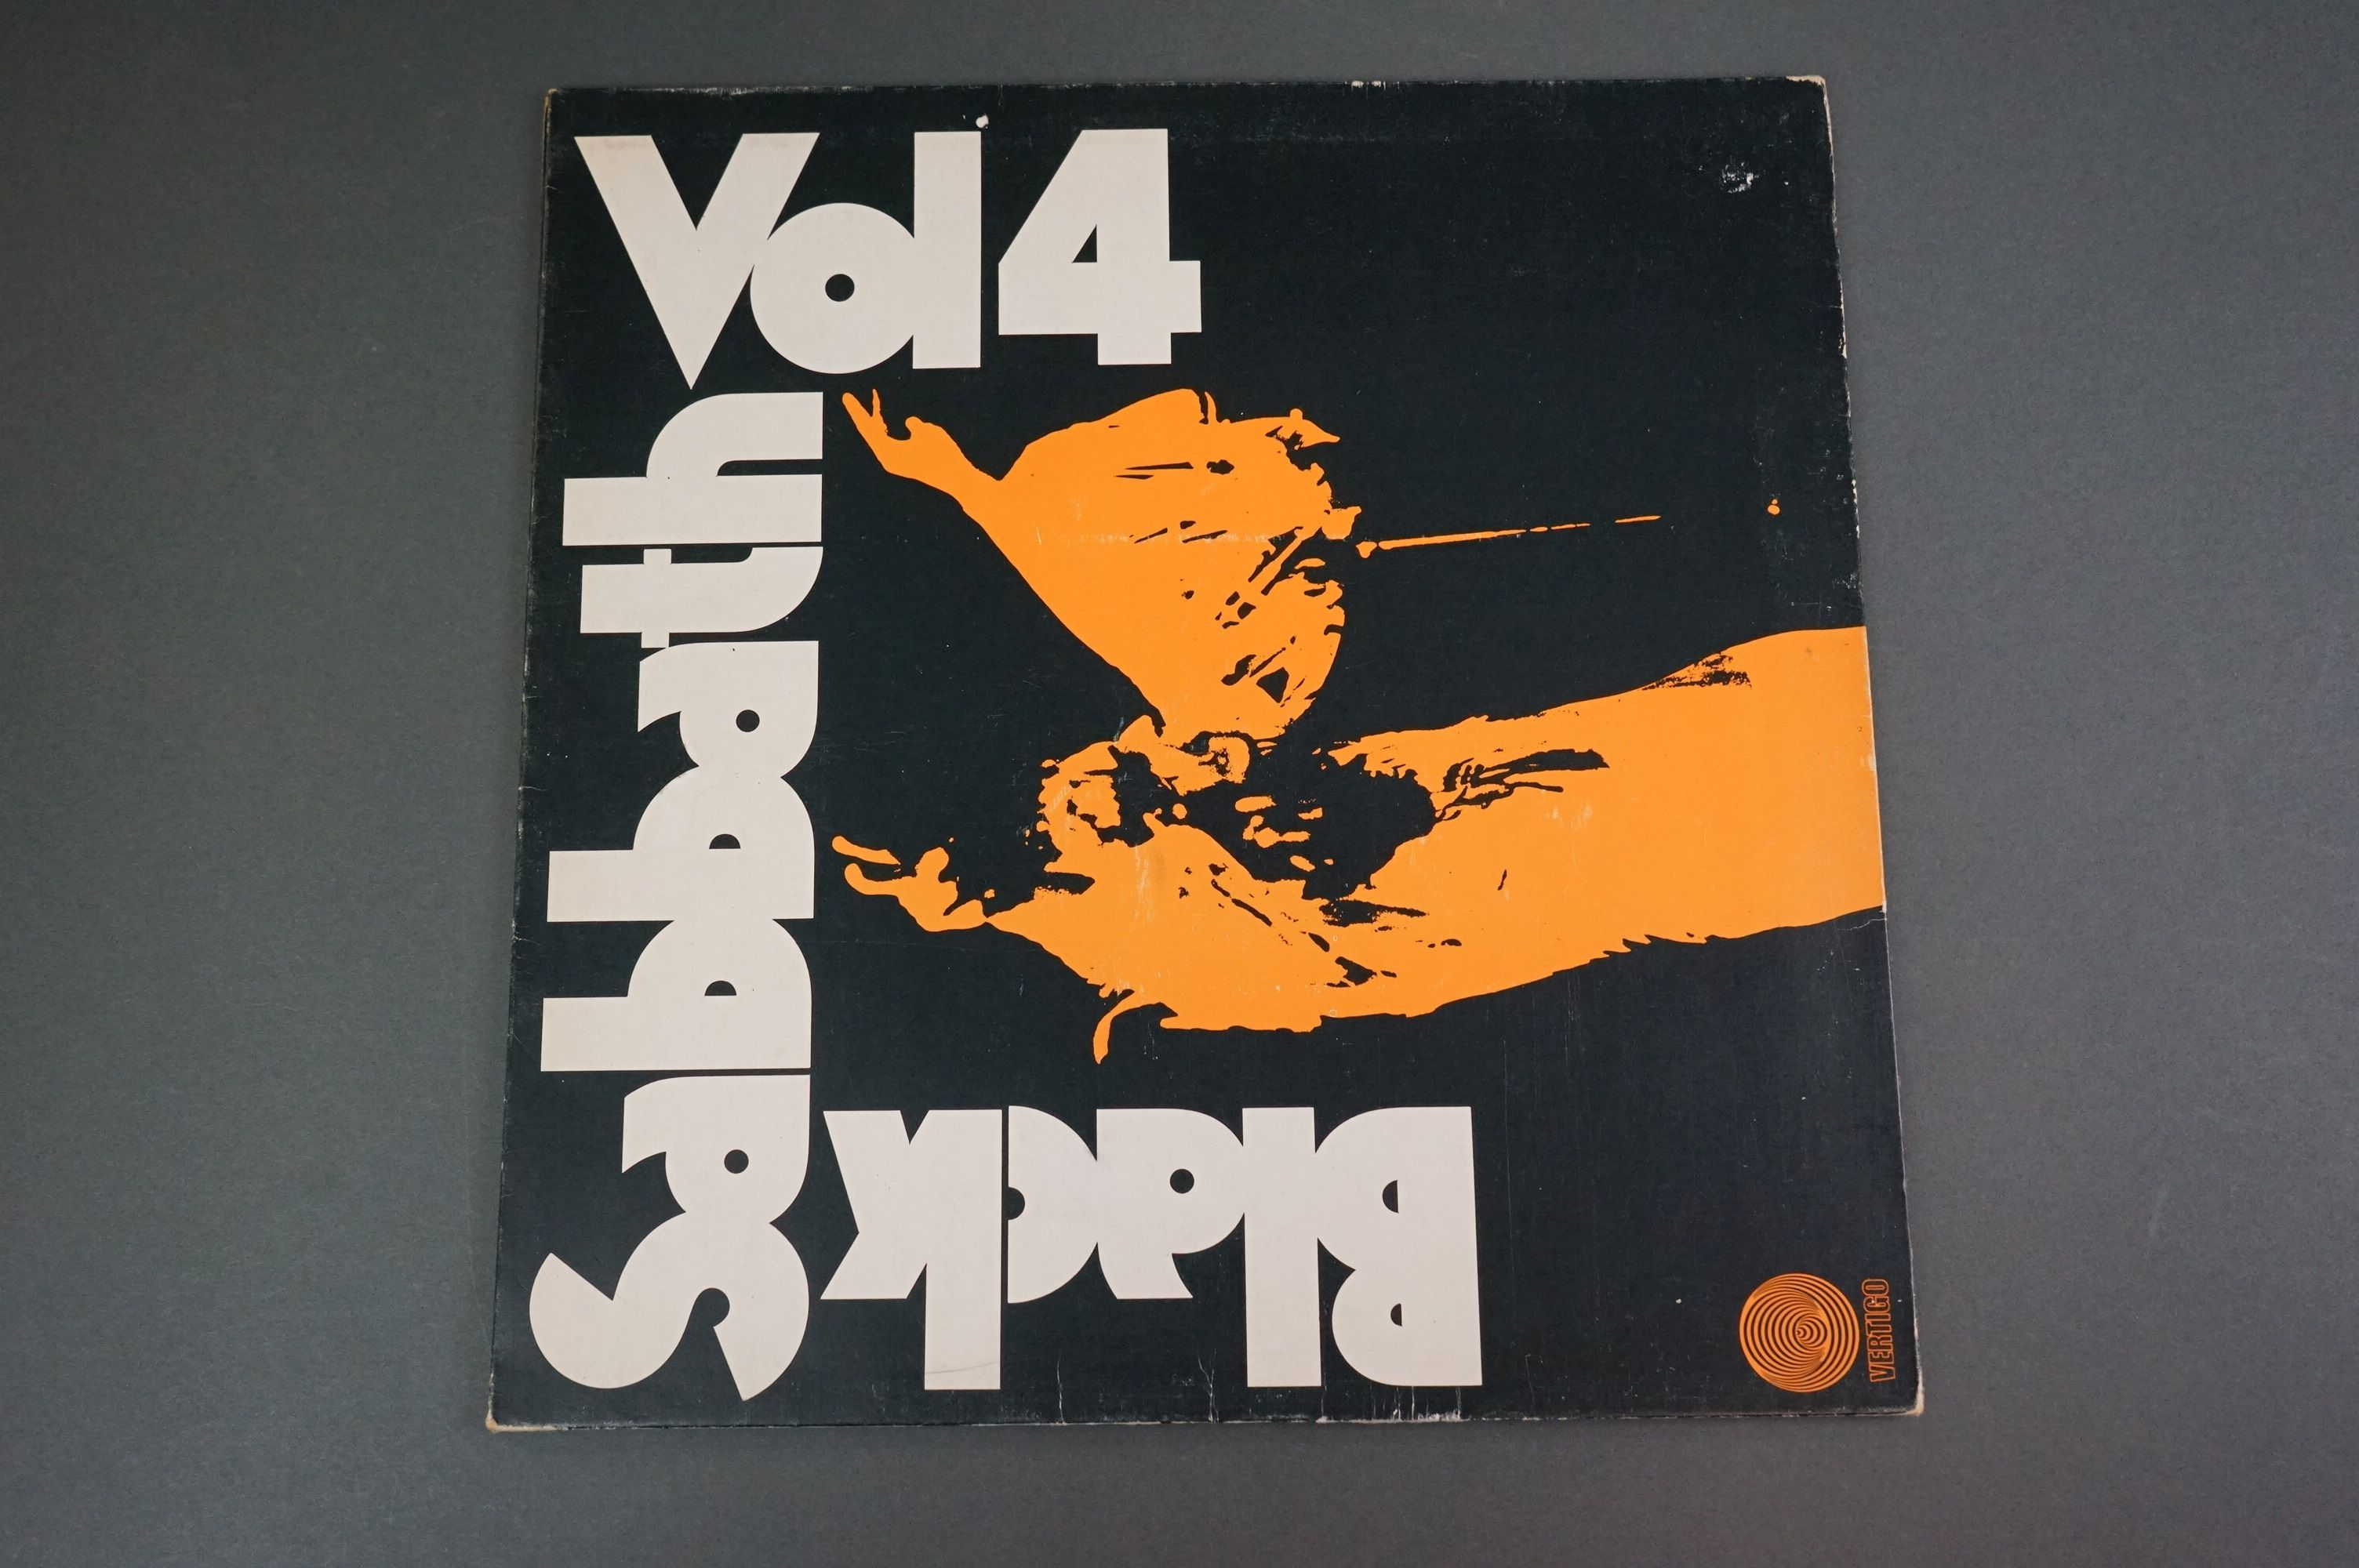 Vinyl - Black Sabbath vol 4 6360071 on Vertigo 1st pressing, no 'made in England' to label, gatefold